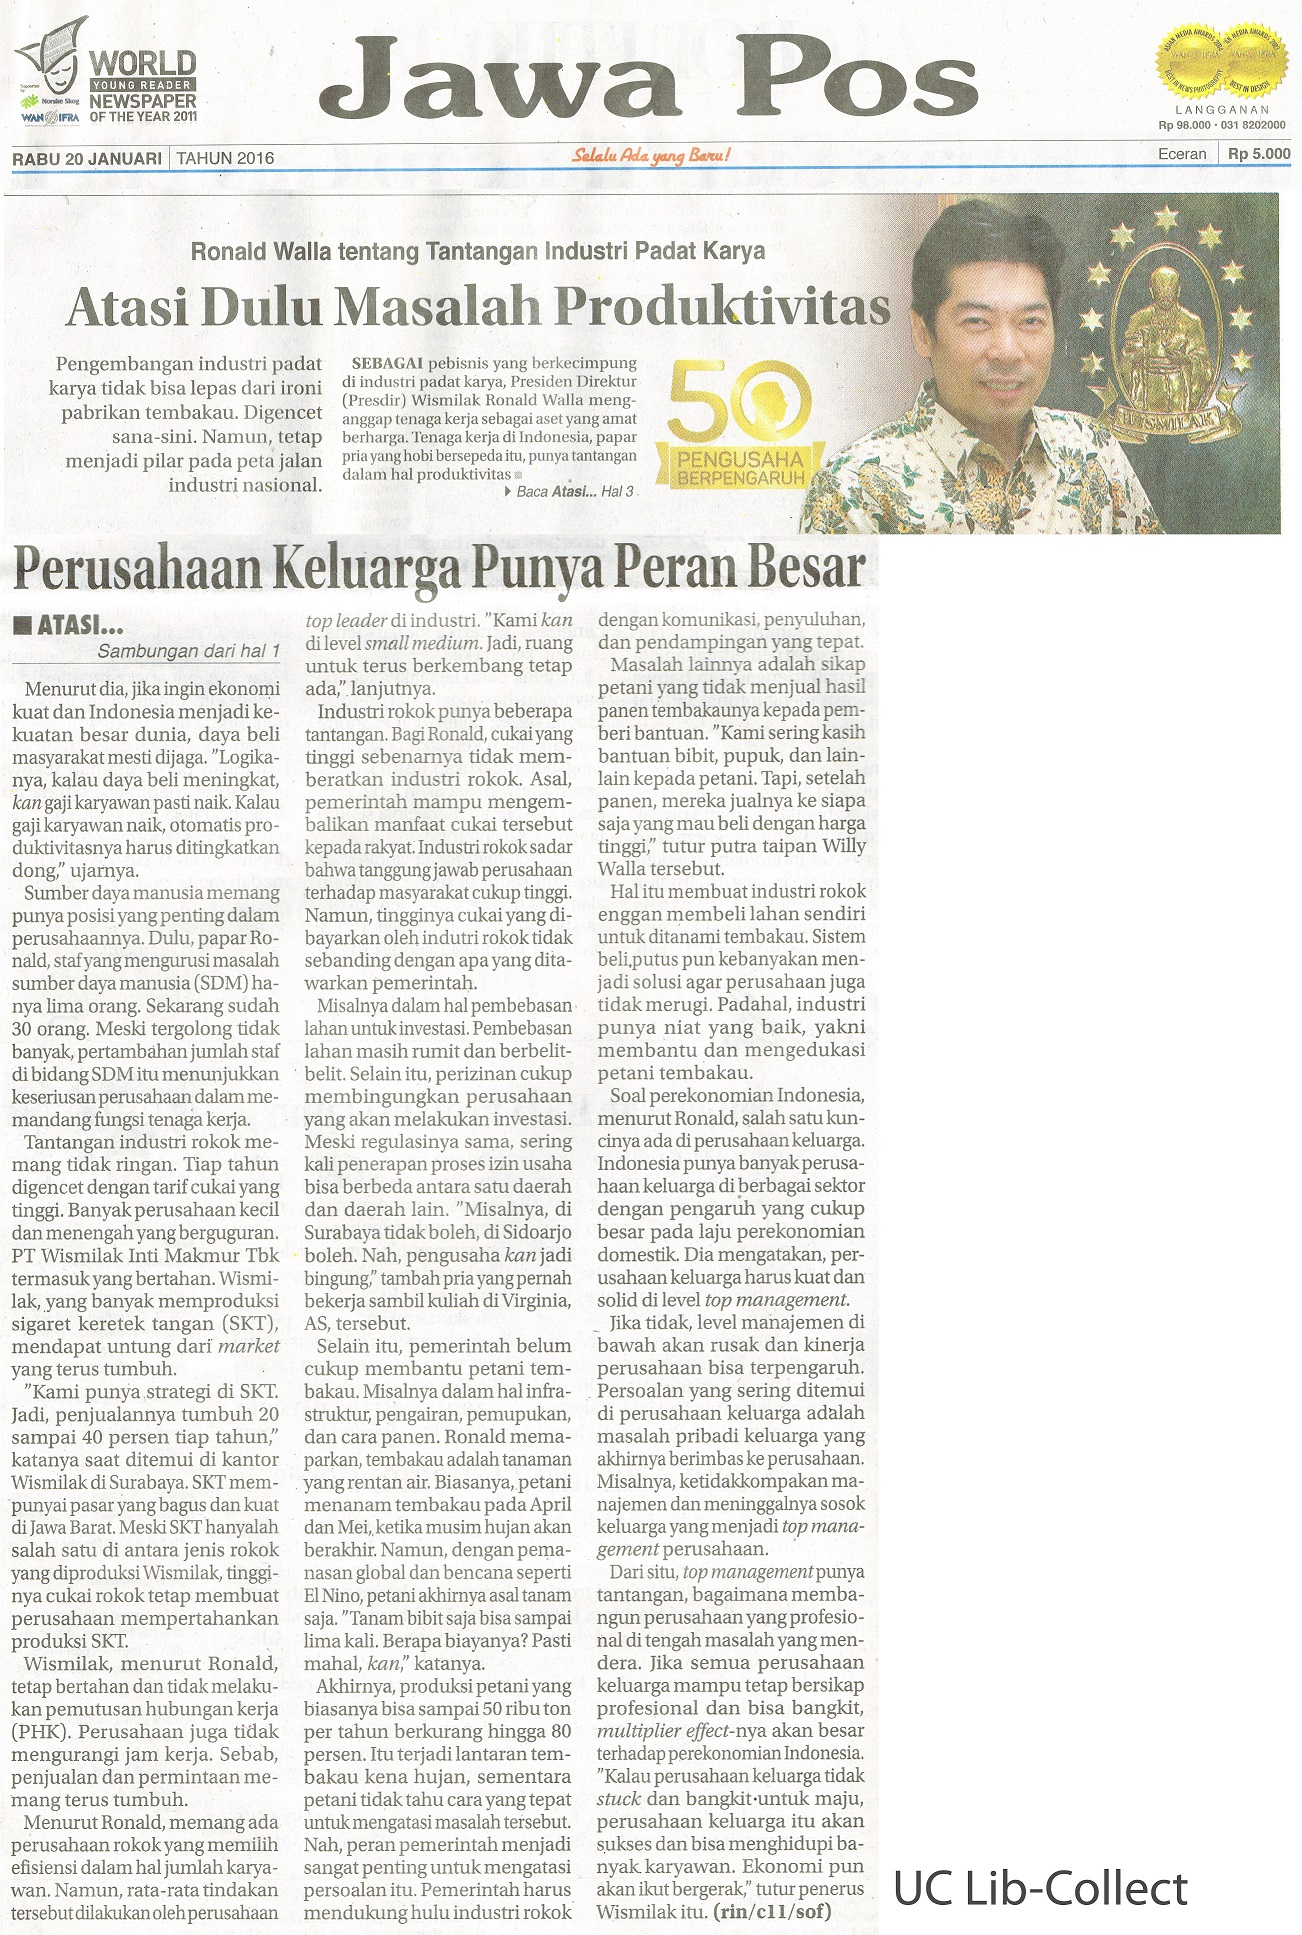 20 Januari 2016. Ronald Walla tentang Tantangan Industri Padat Karya_Atasi Dulu Masalah Produktivitas. Jawa Pos. 20 Januari 2016.Hal.1,3